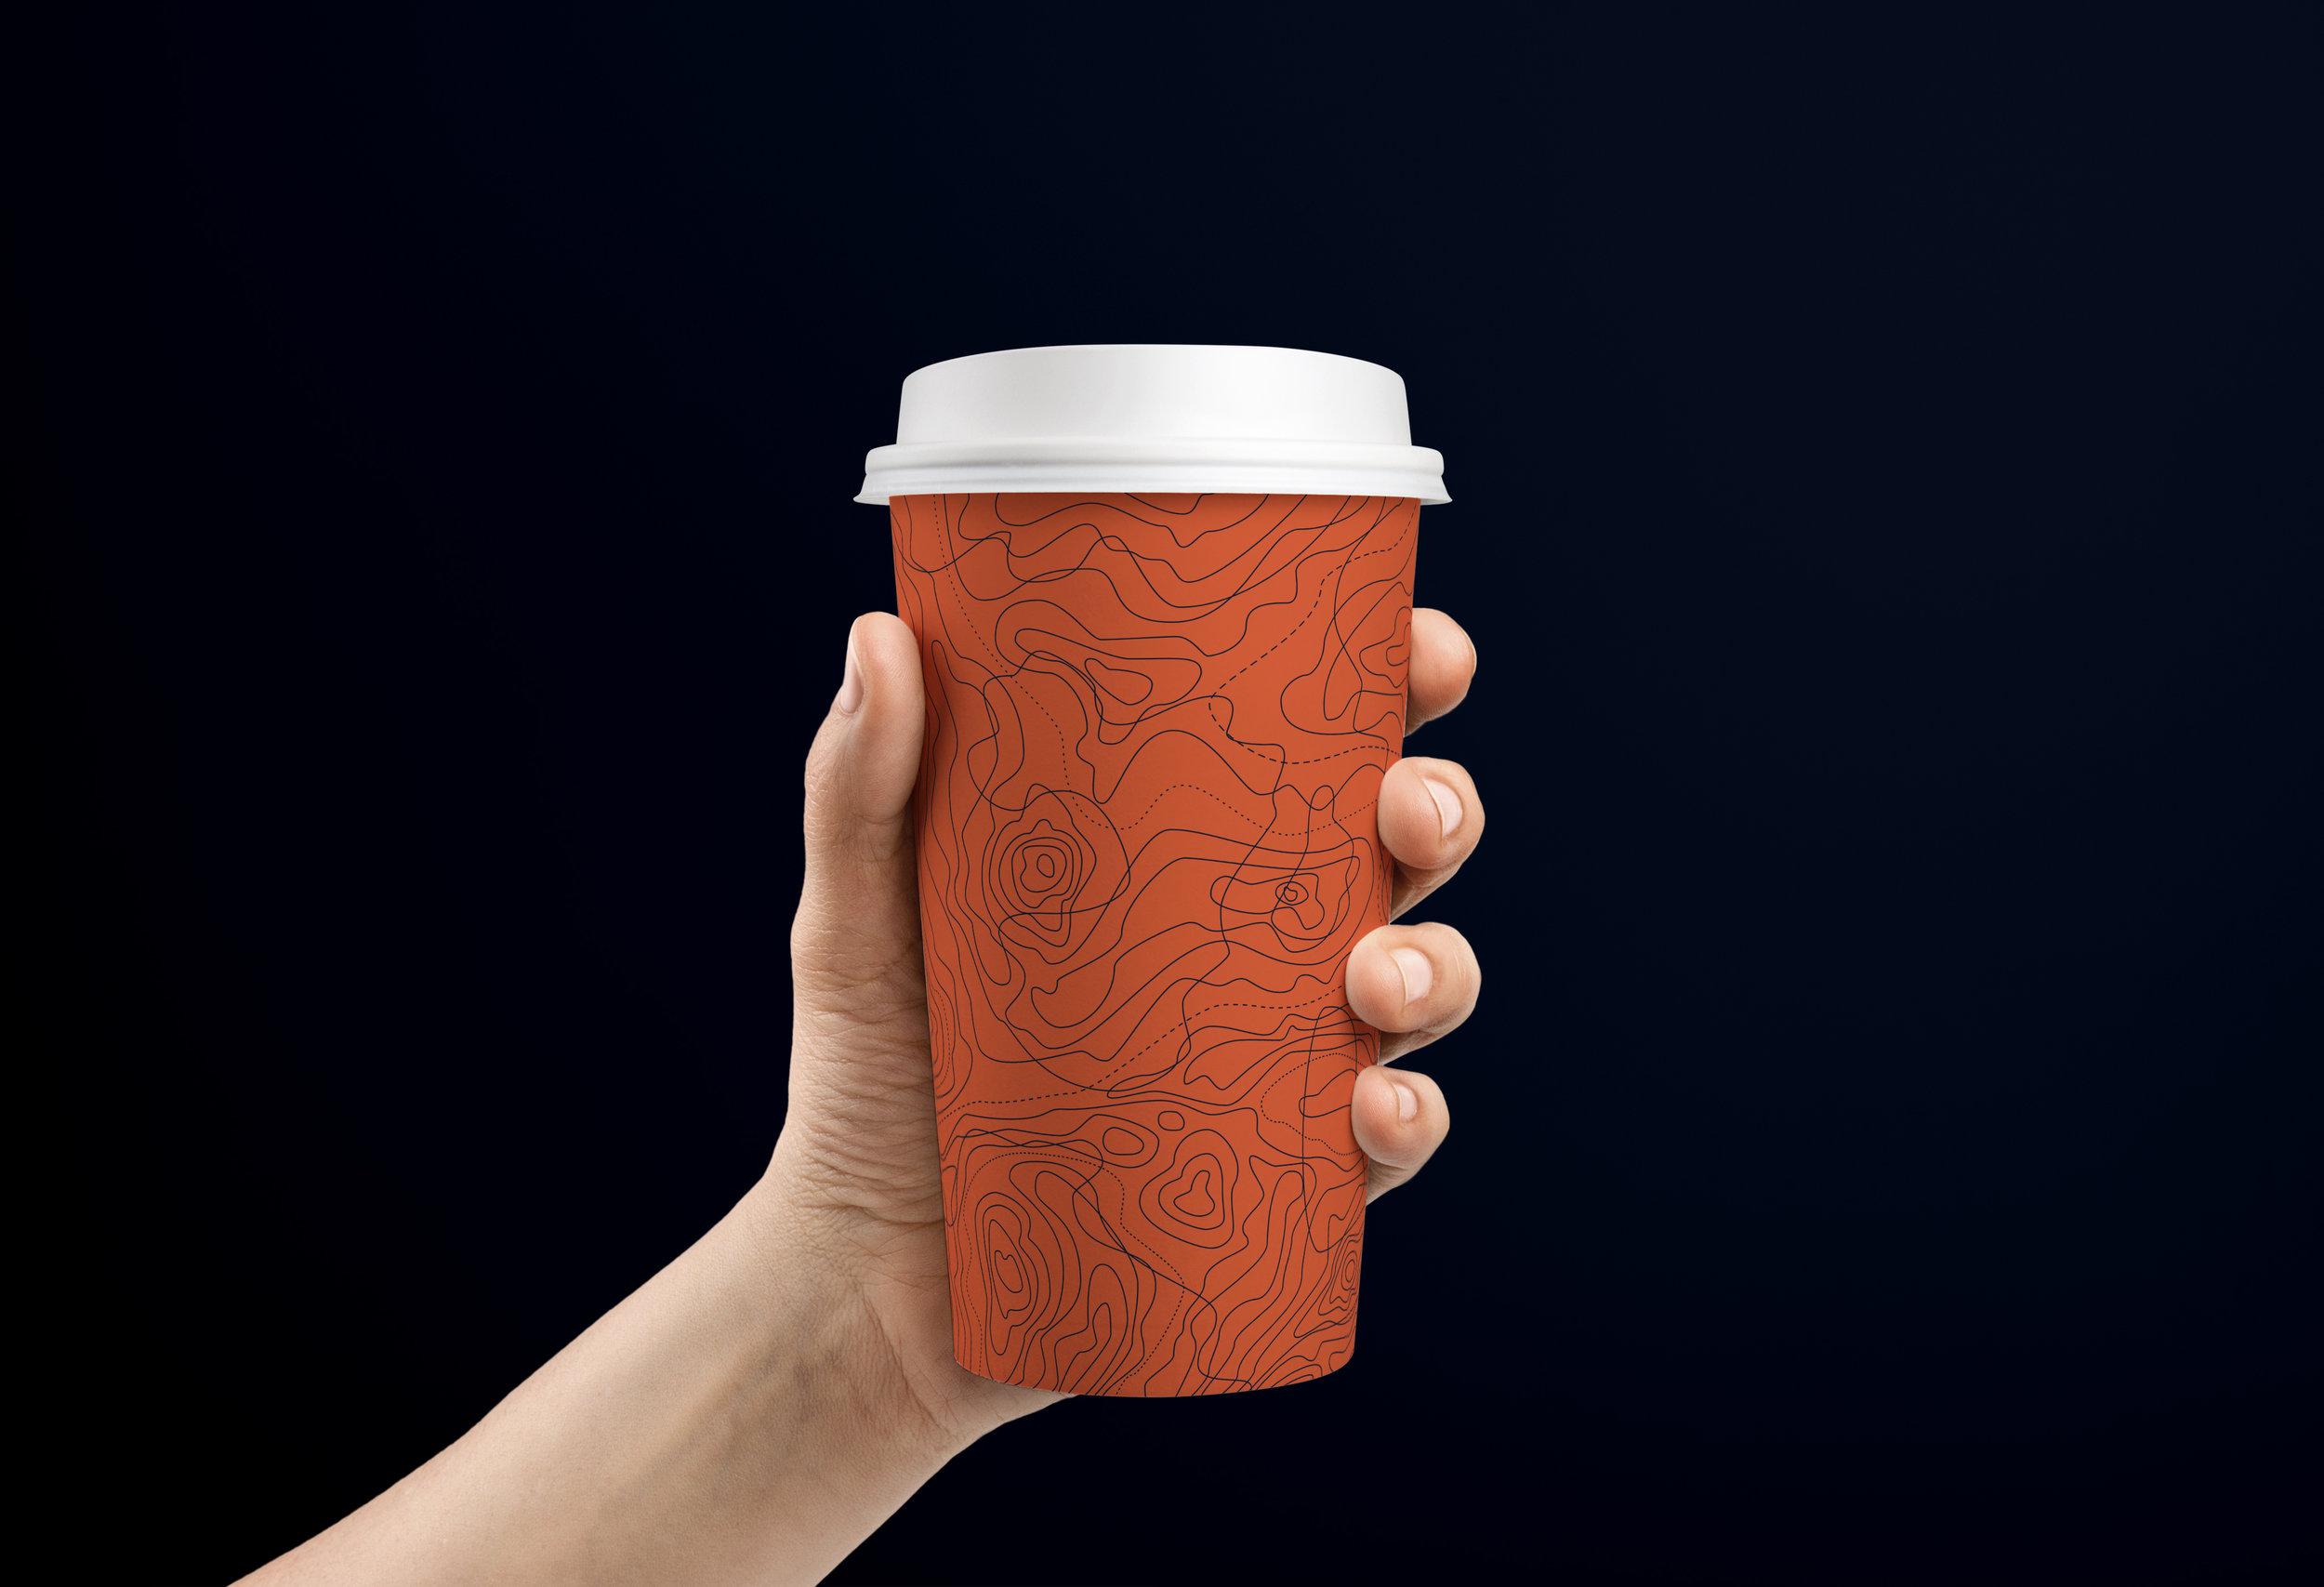 Medium_cup.jpg